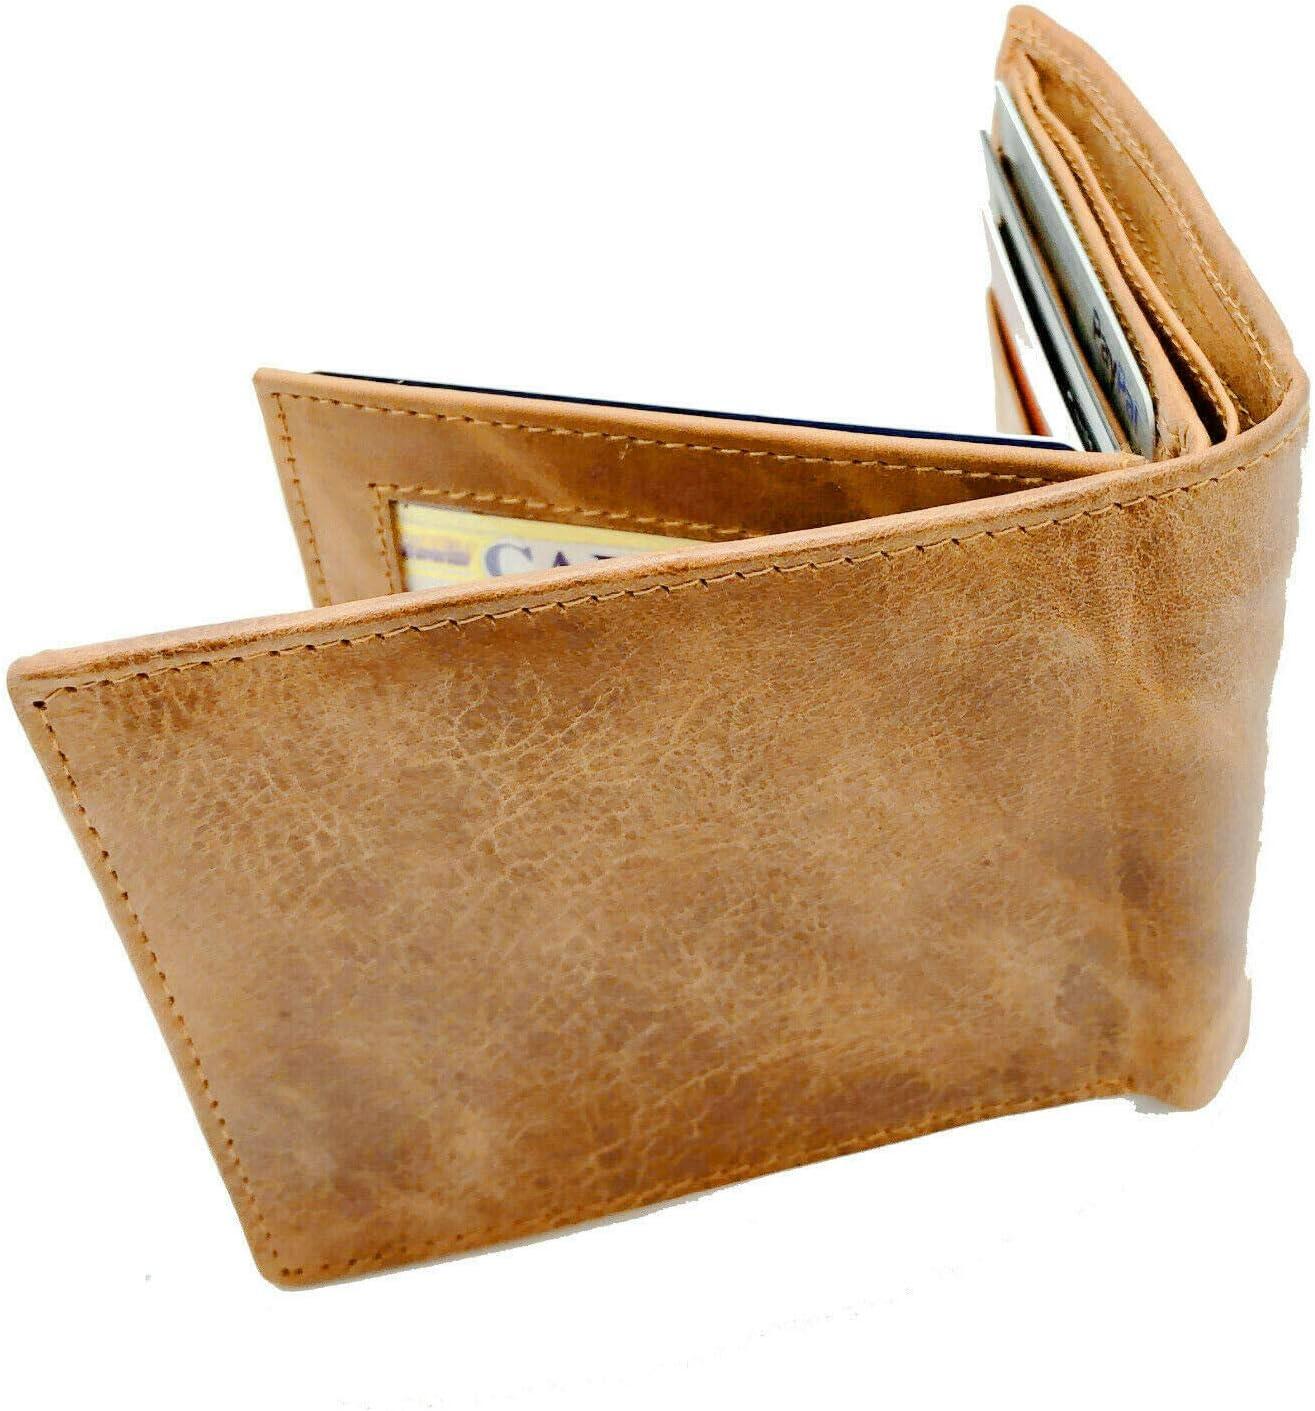 Cowhide Leather Men's Bifold Premium Wallet Brown Handcrafted